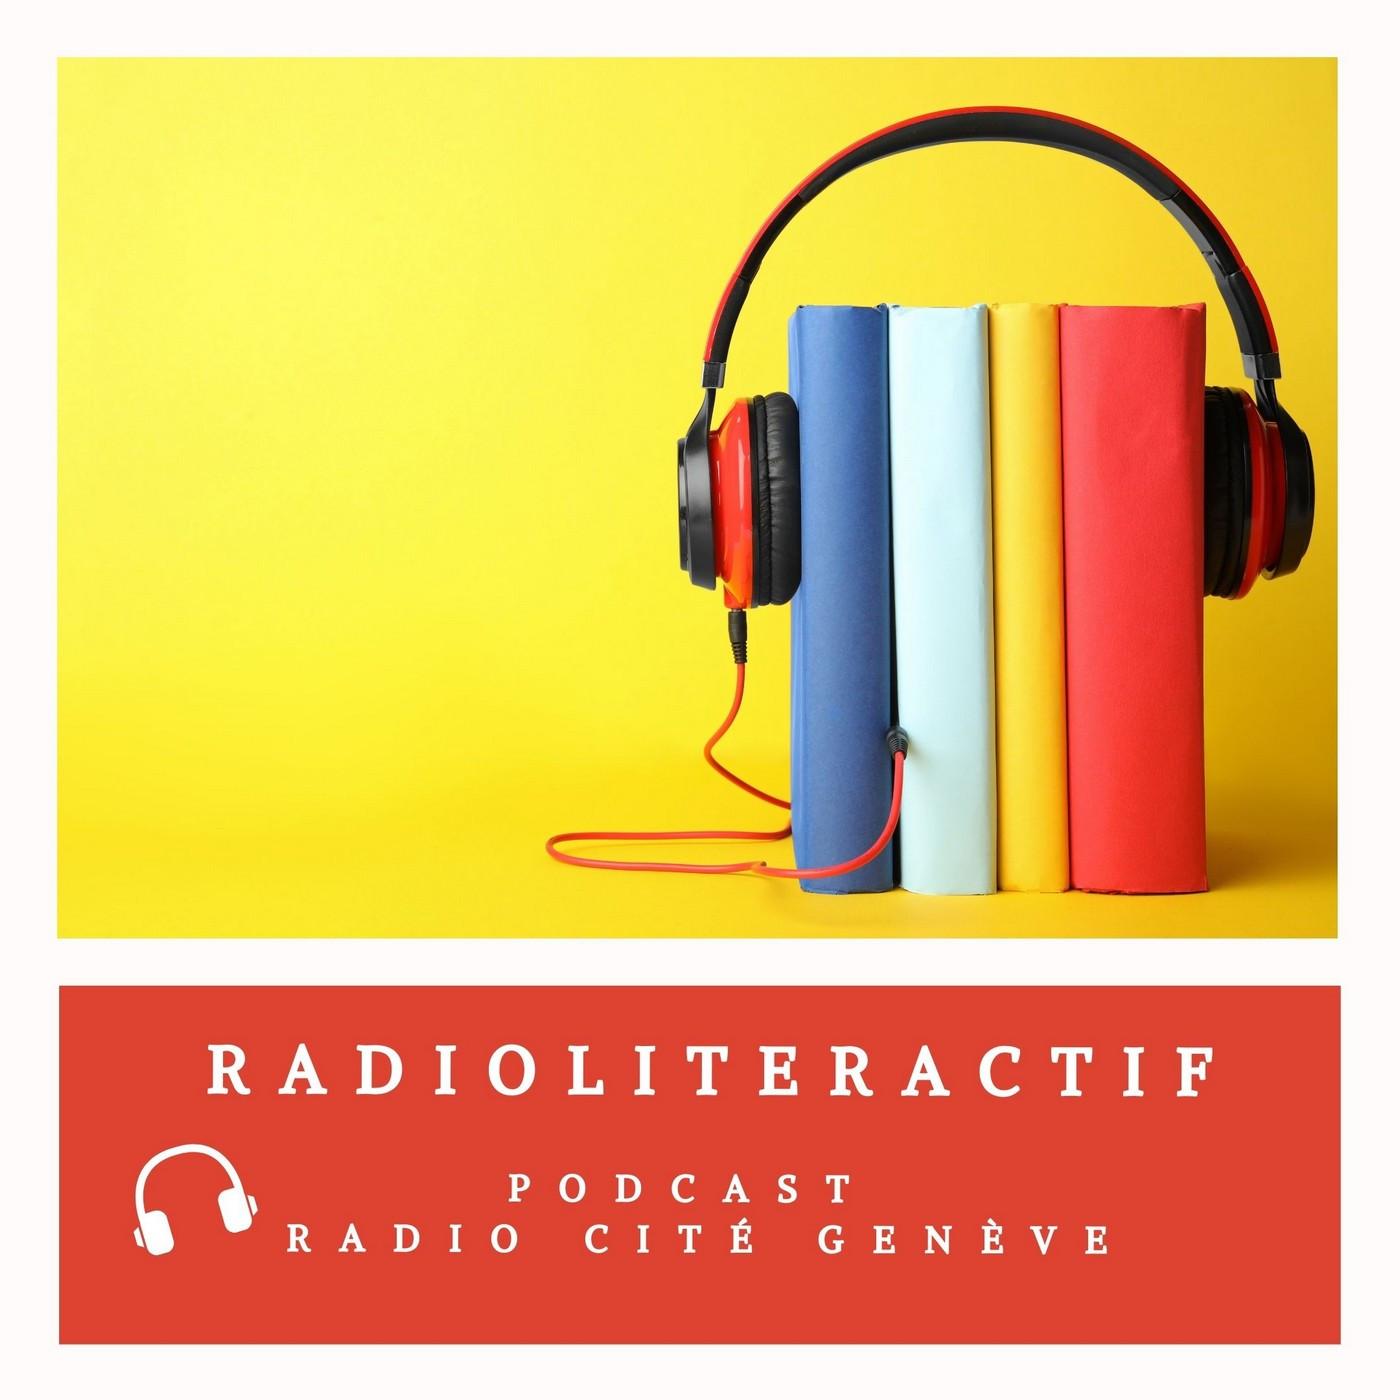 Radioliteractif du 07/12/20 - Laura Ulonat -une histoire italienne